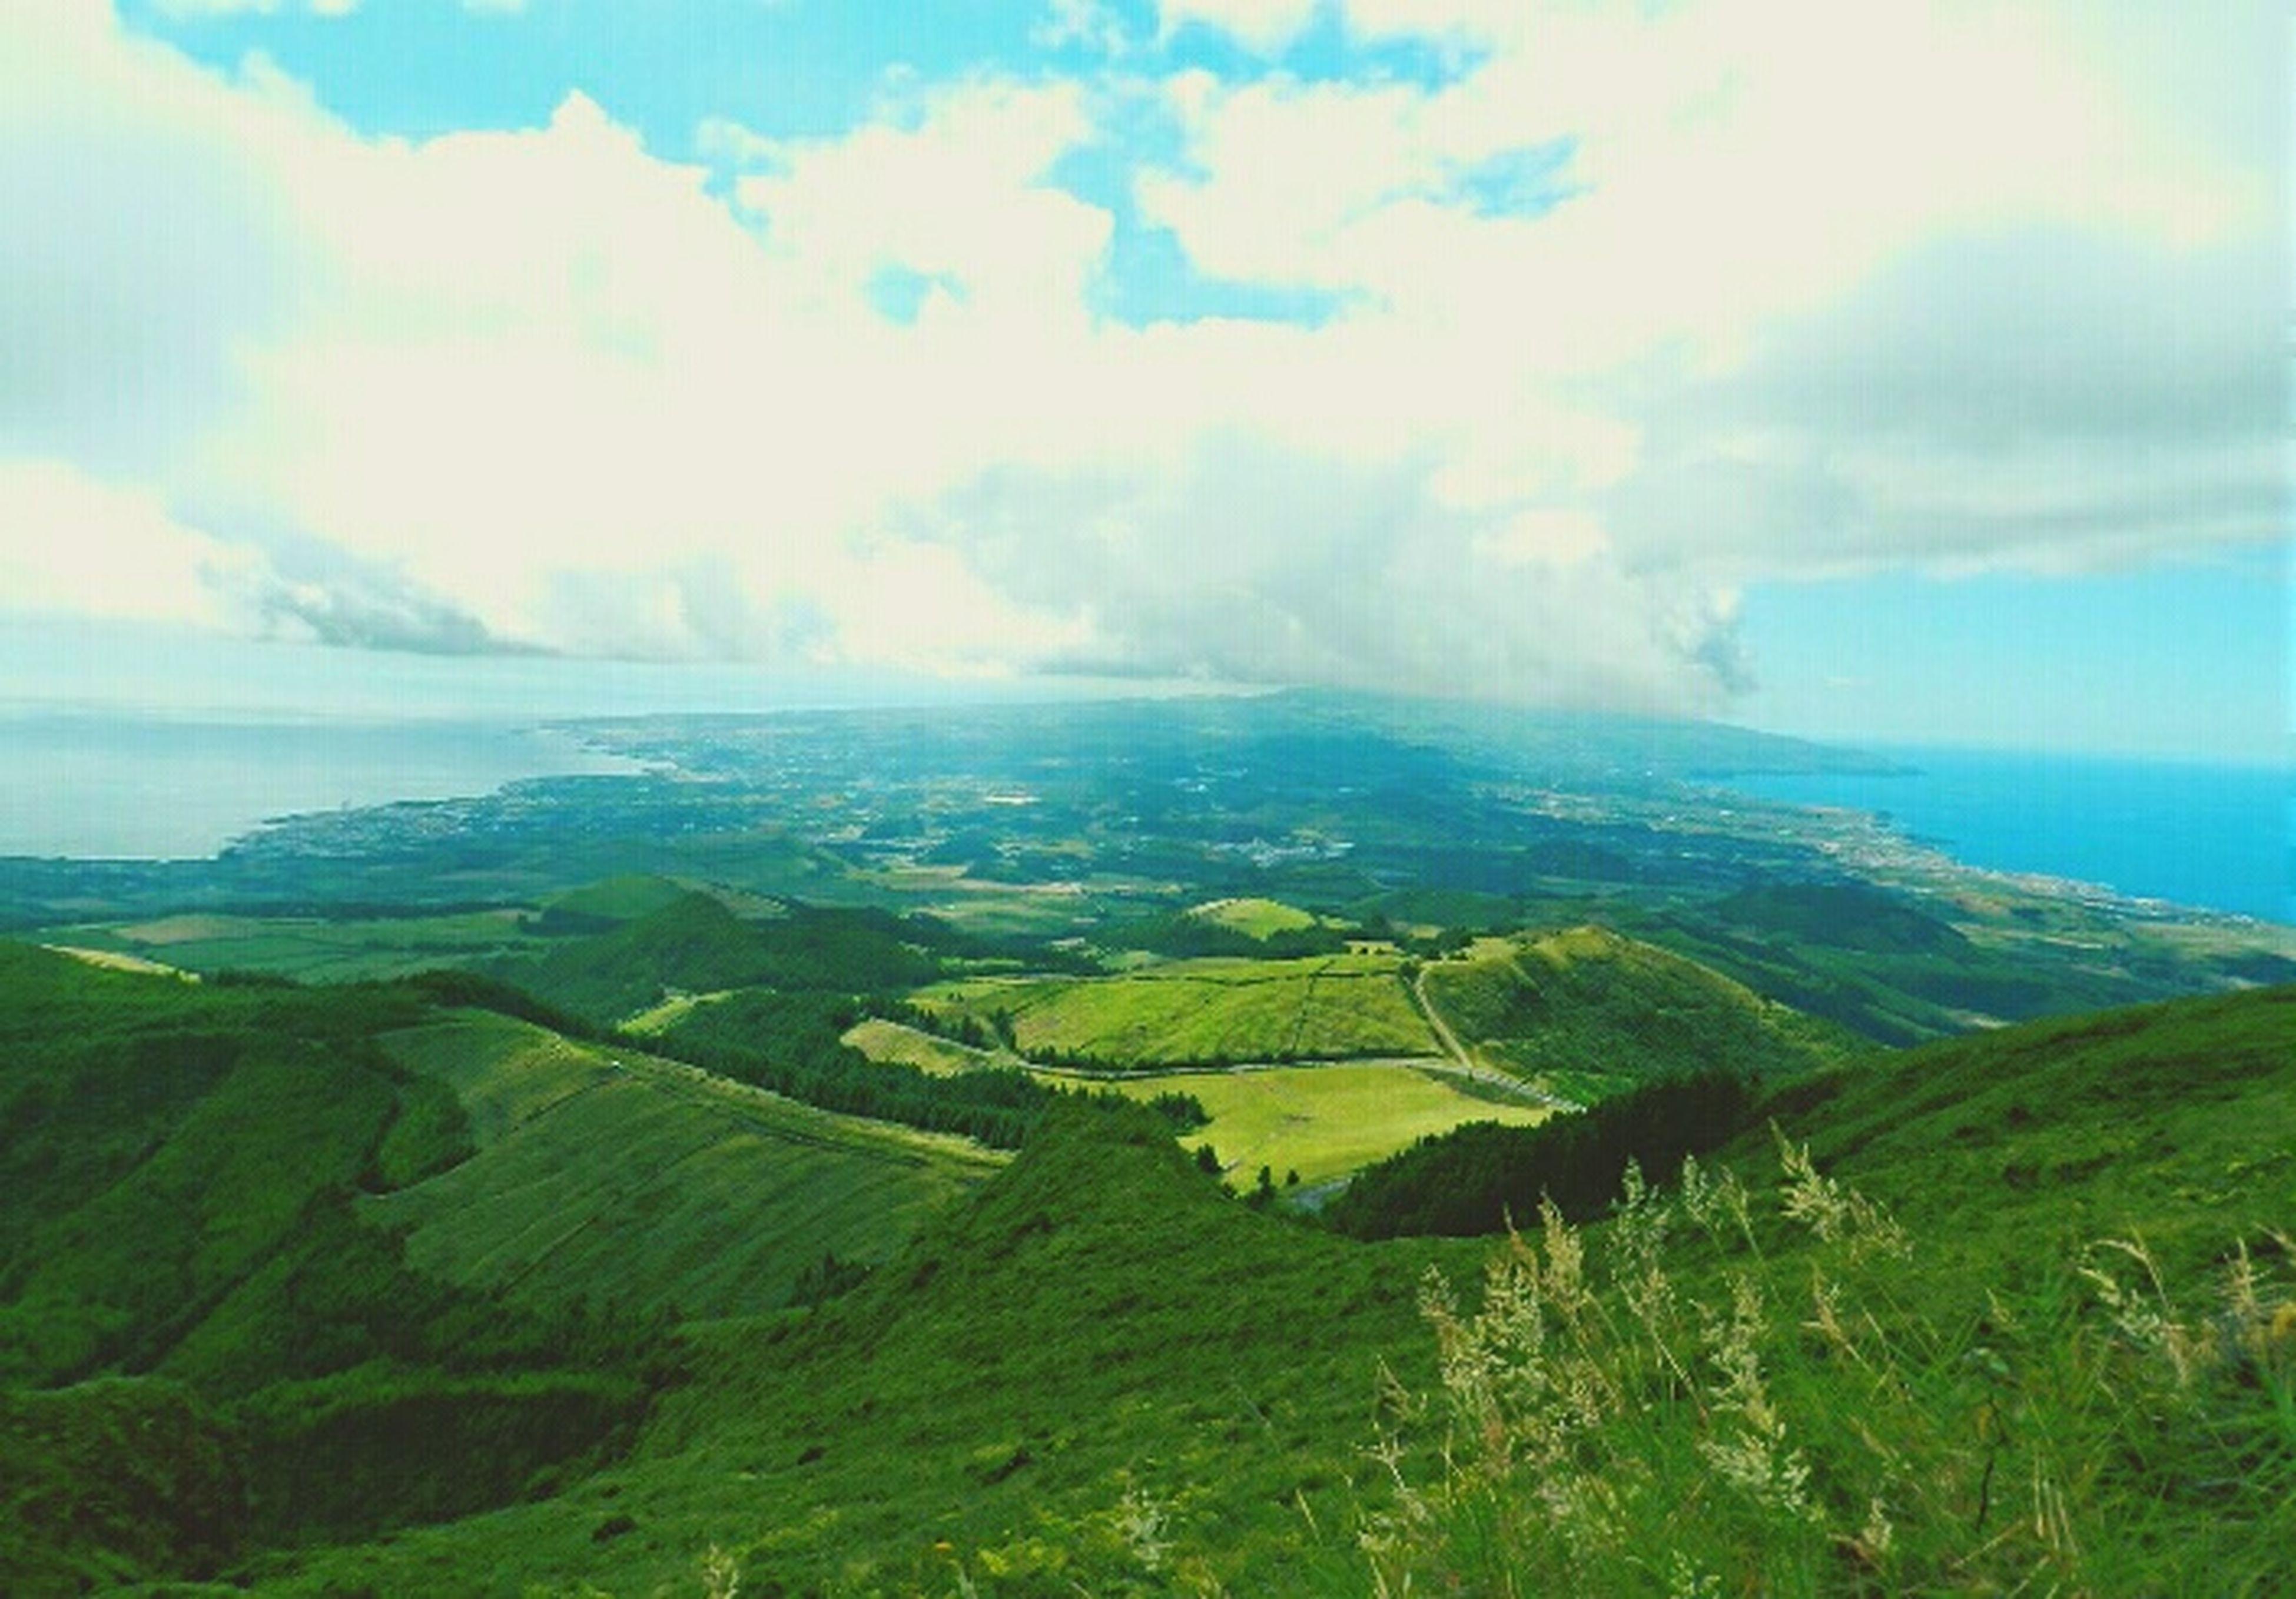 Edge Of The World Cerra Da Agua Alta Lagoadofogo Açores Saomiguel Azores Portugal Hiking Nature